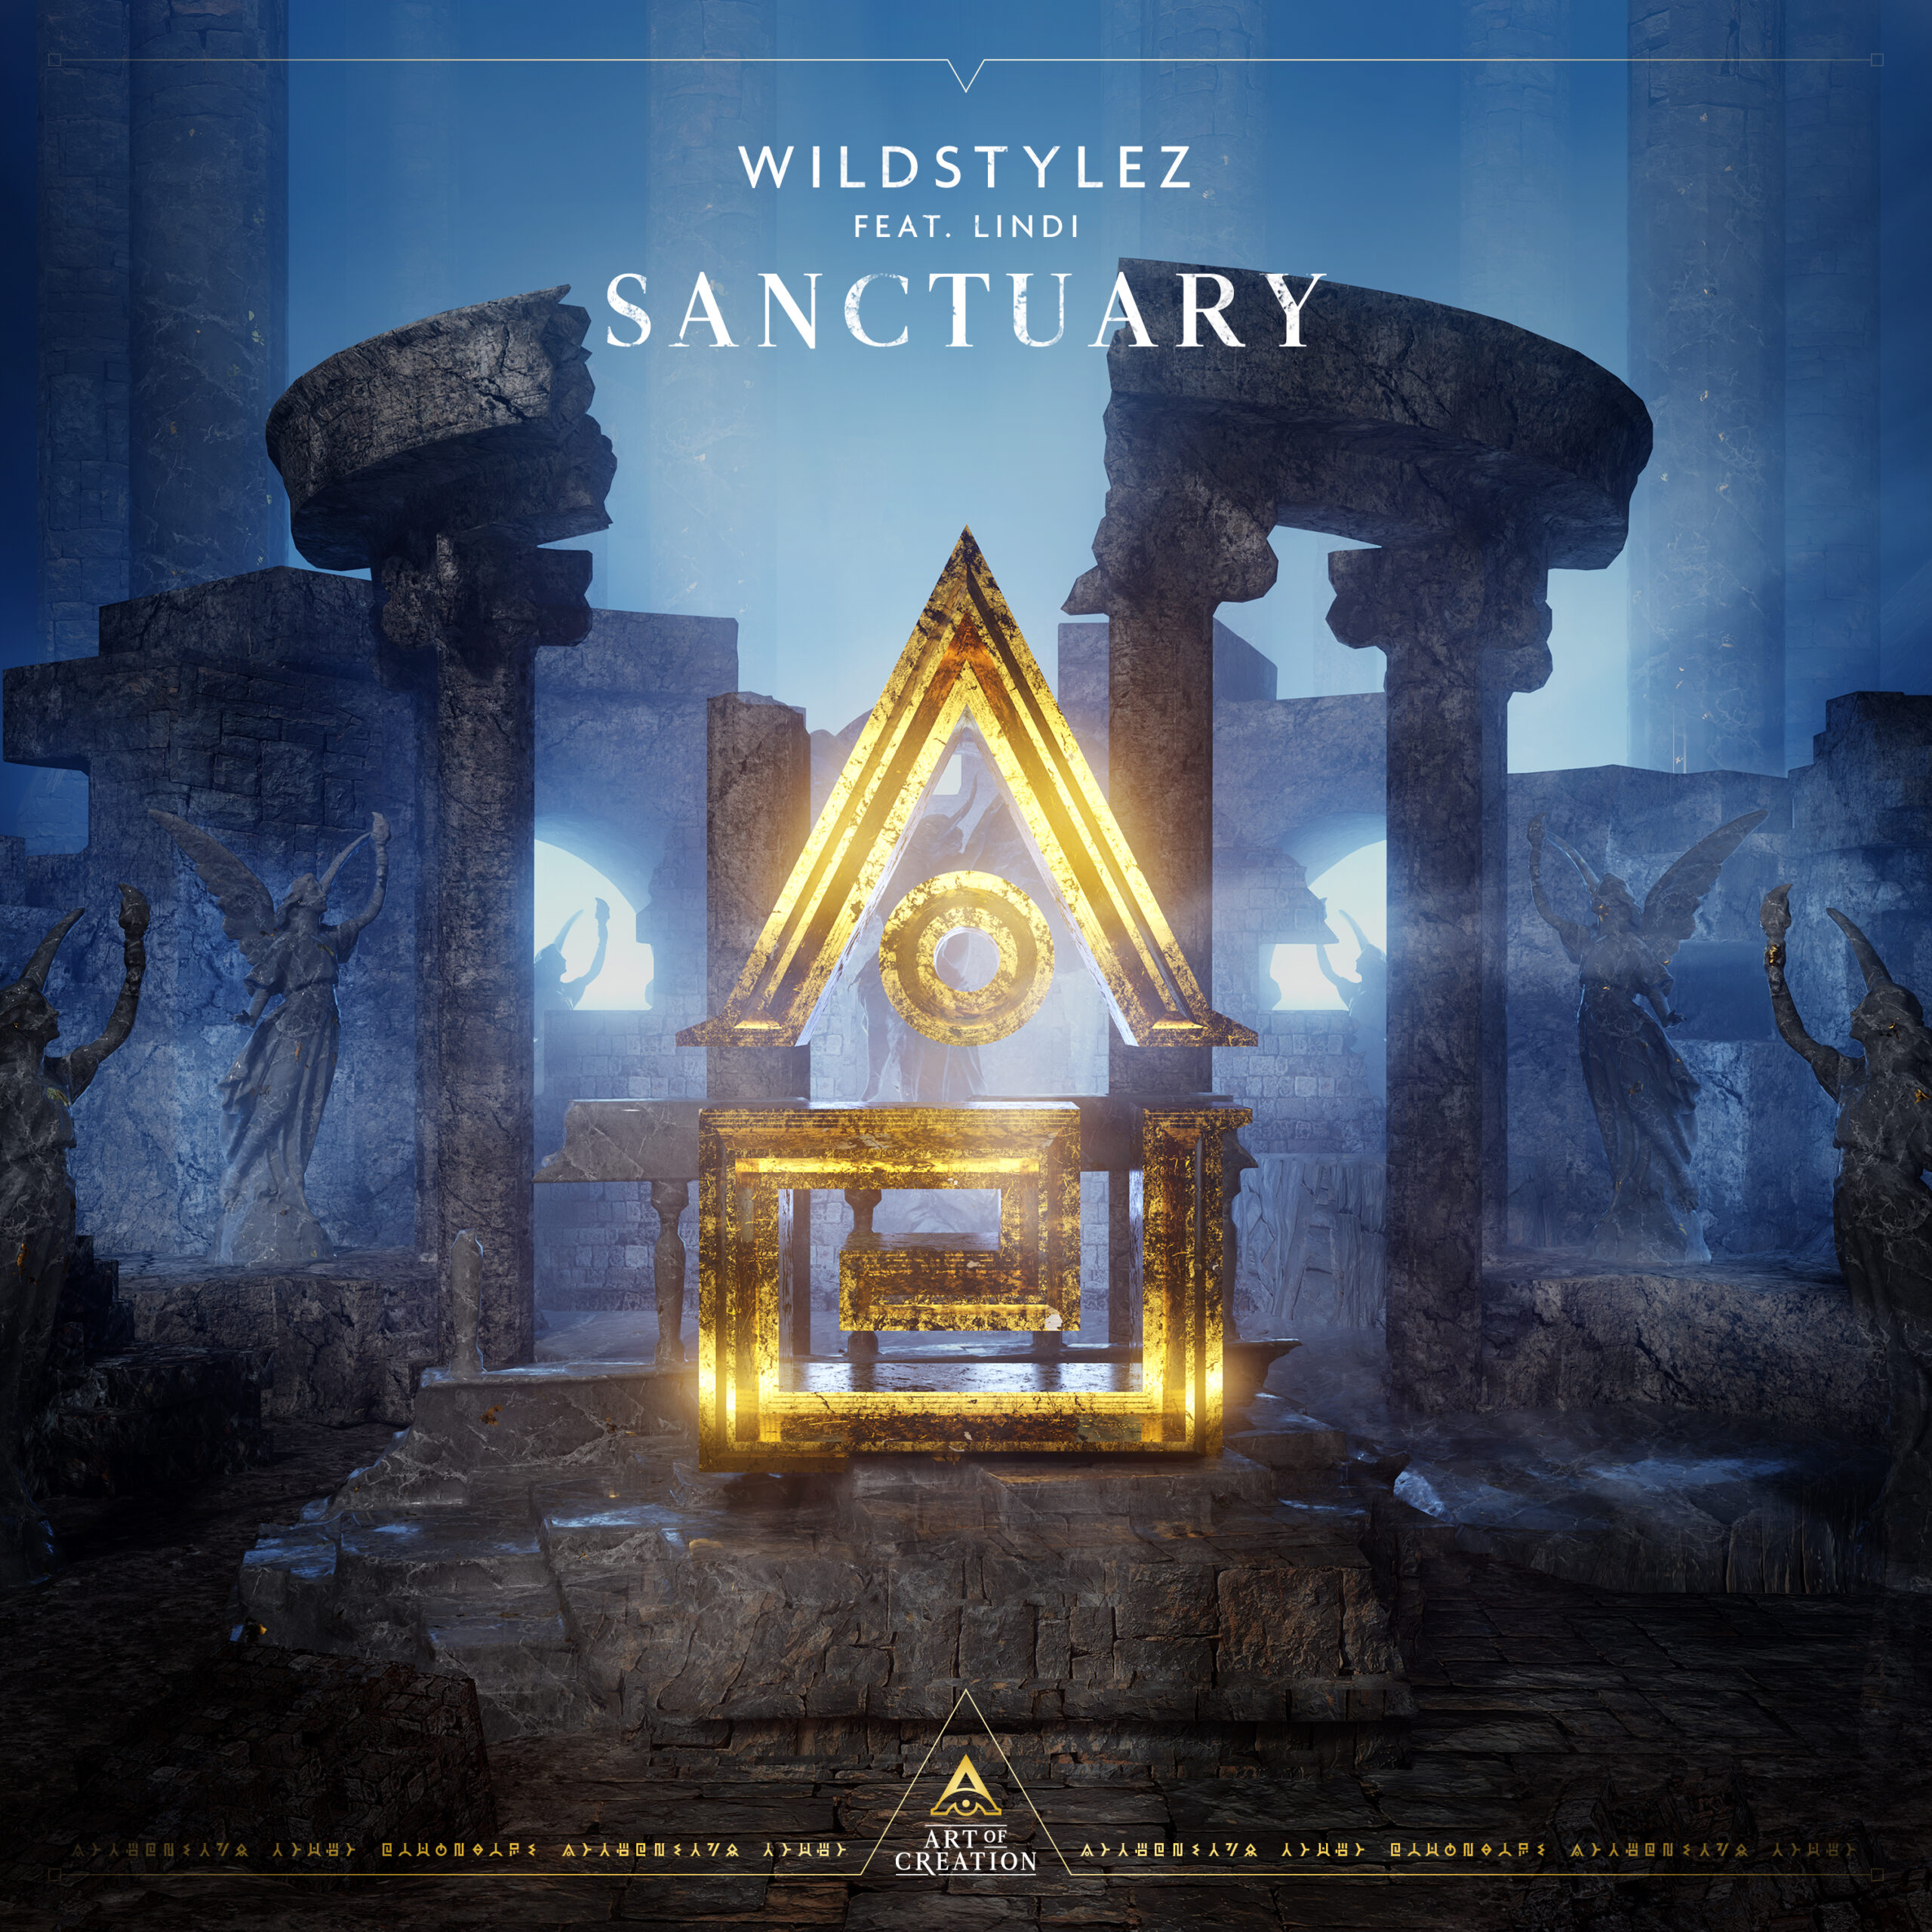 Wildstylez ft. Lindi - Sanctuary